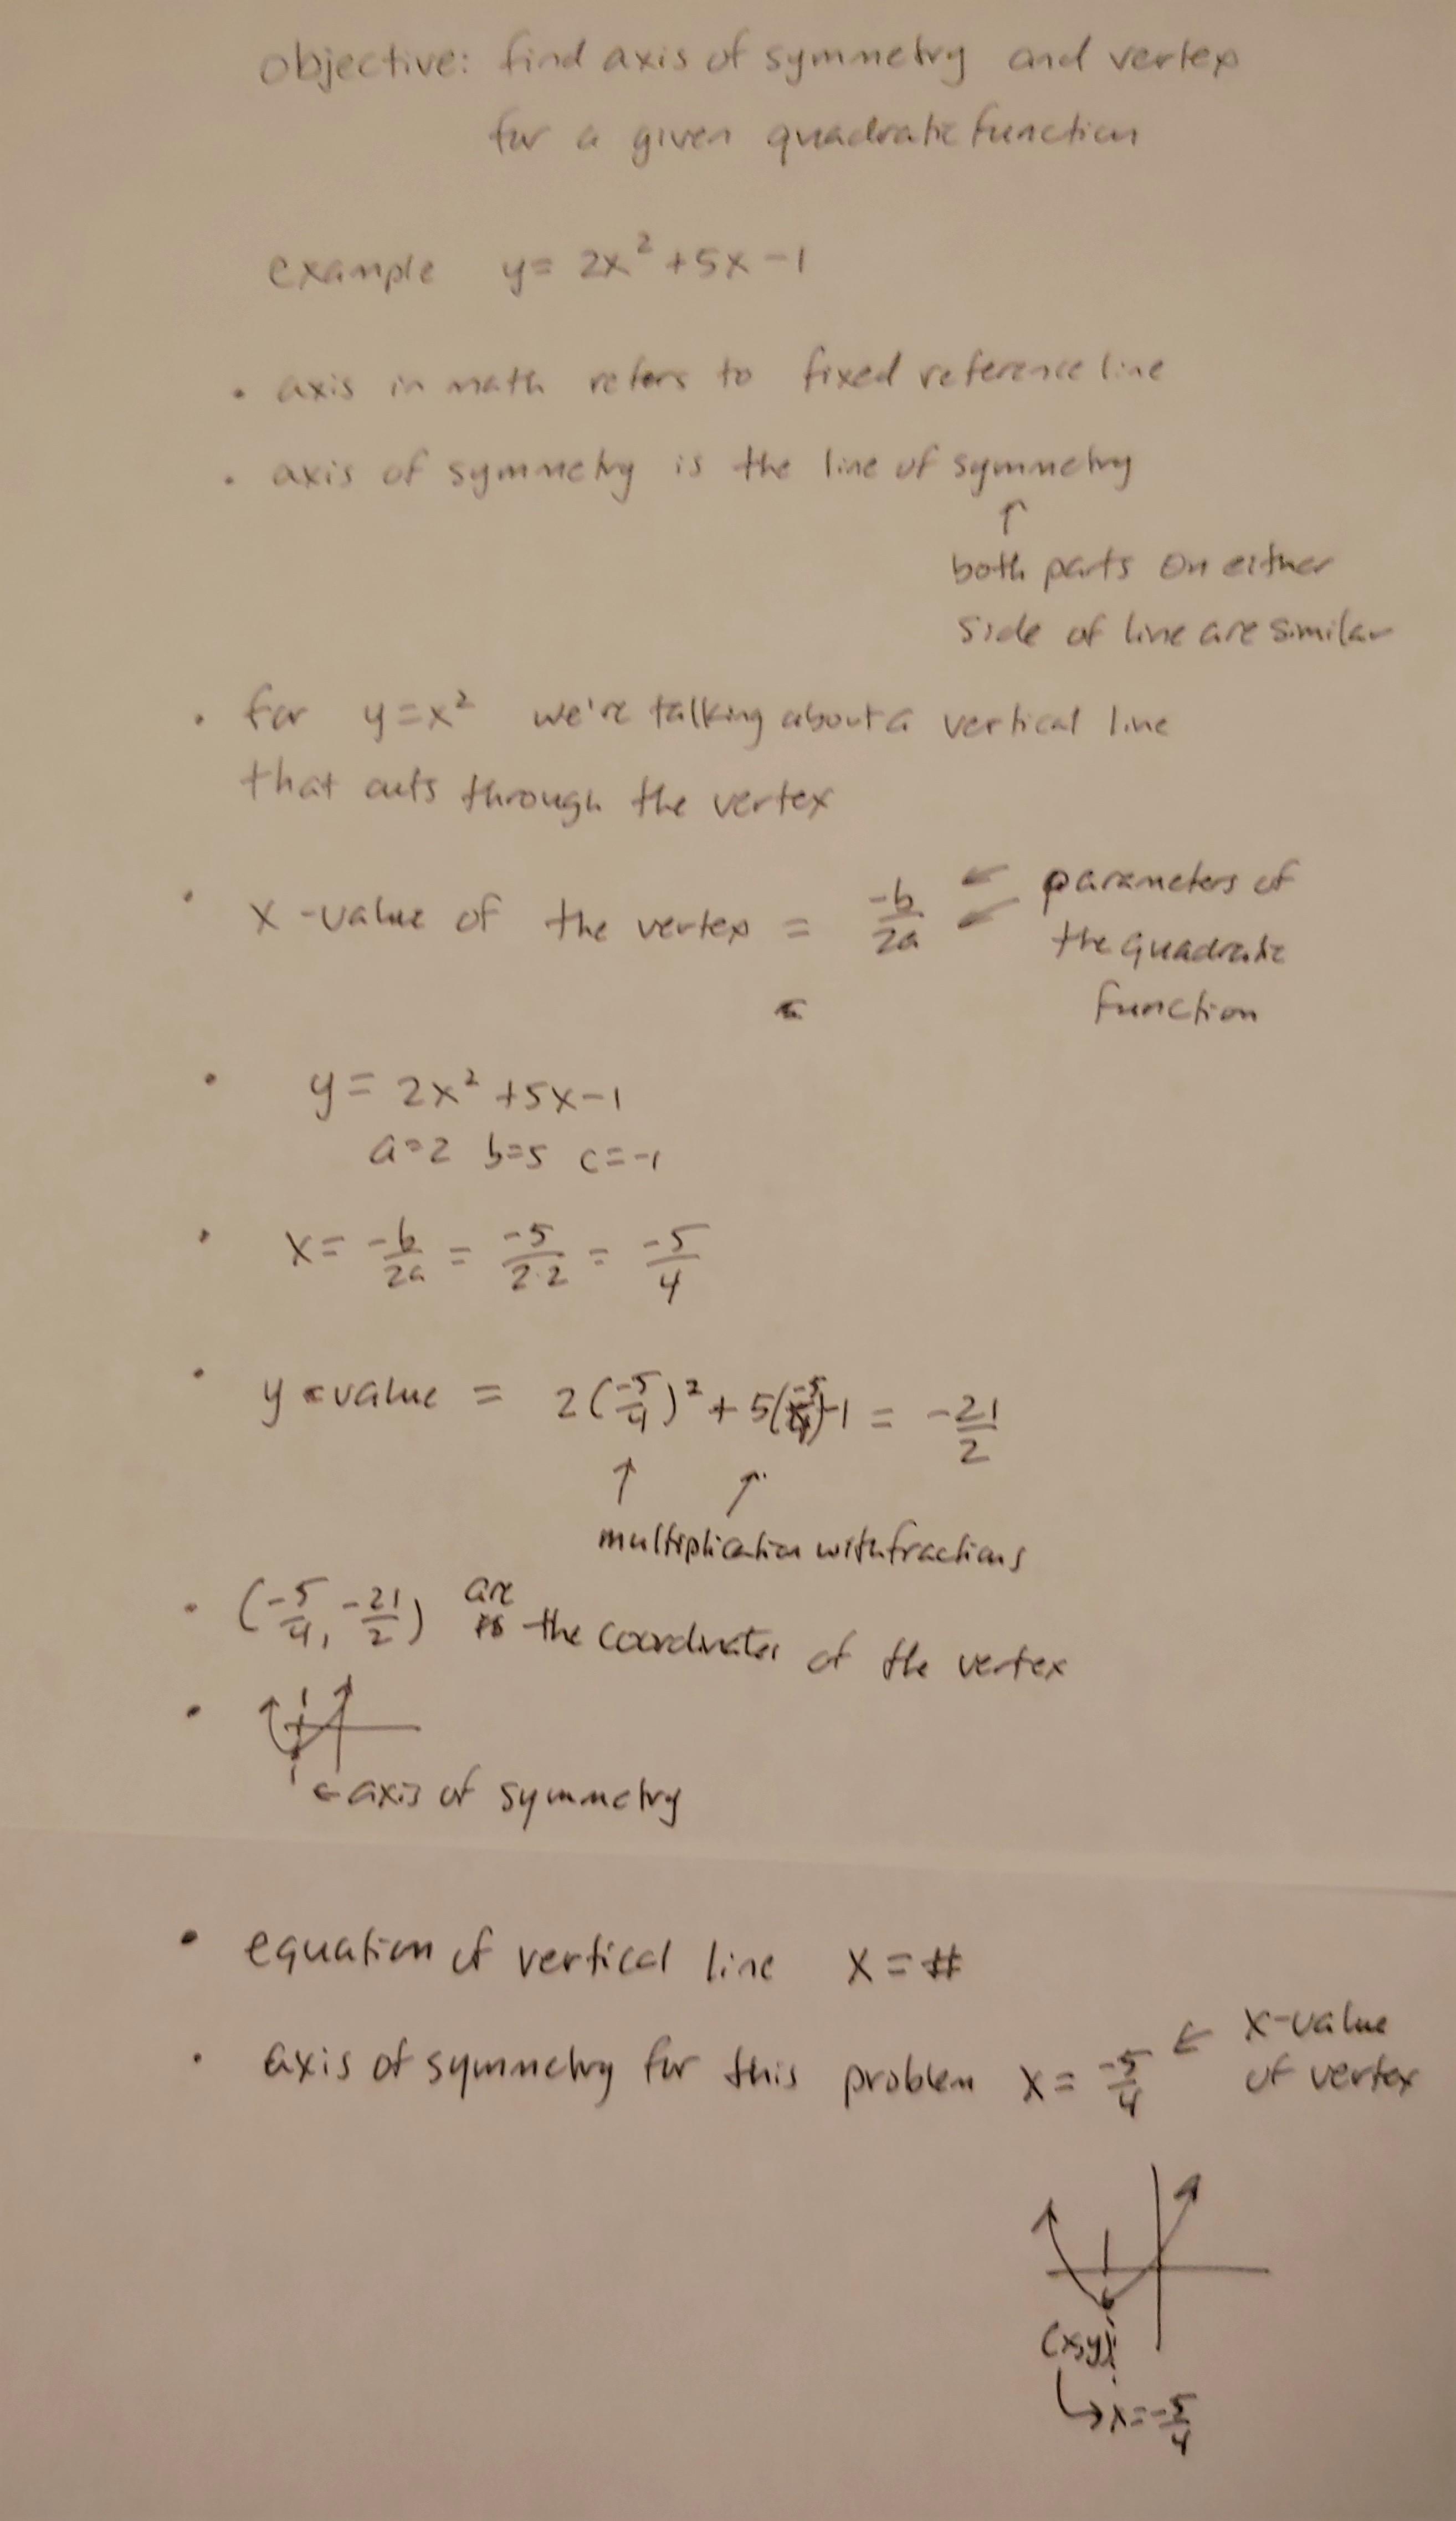 axis of symmetry problem broken down